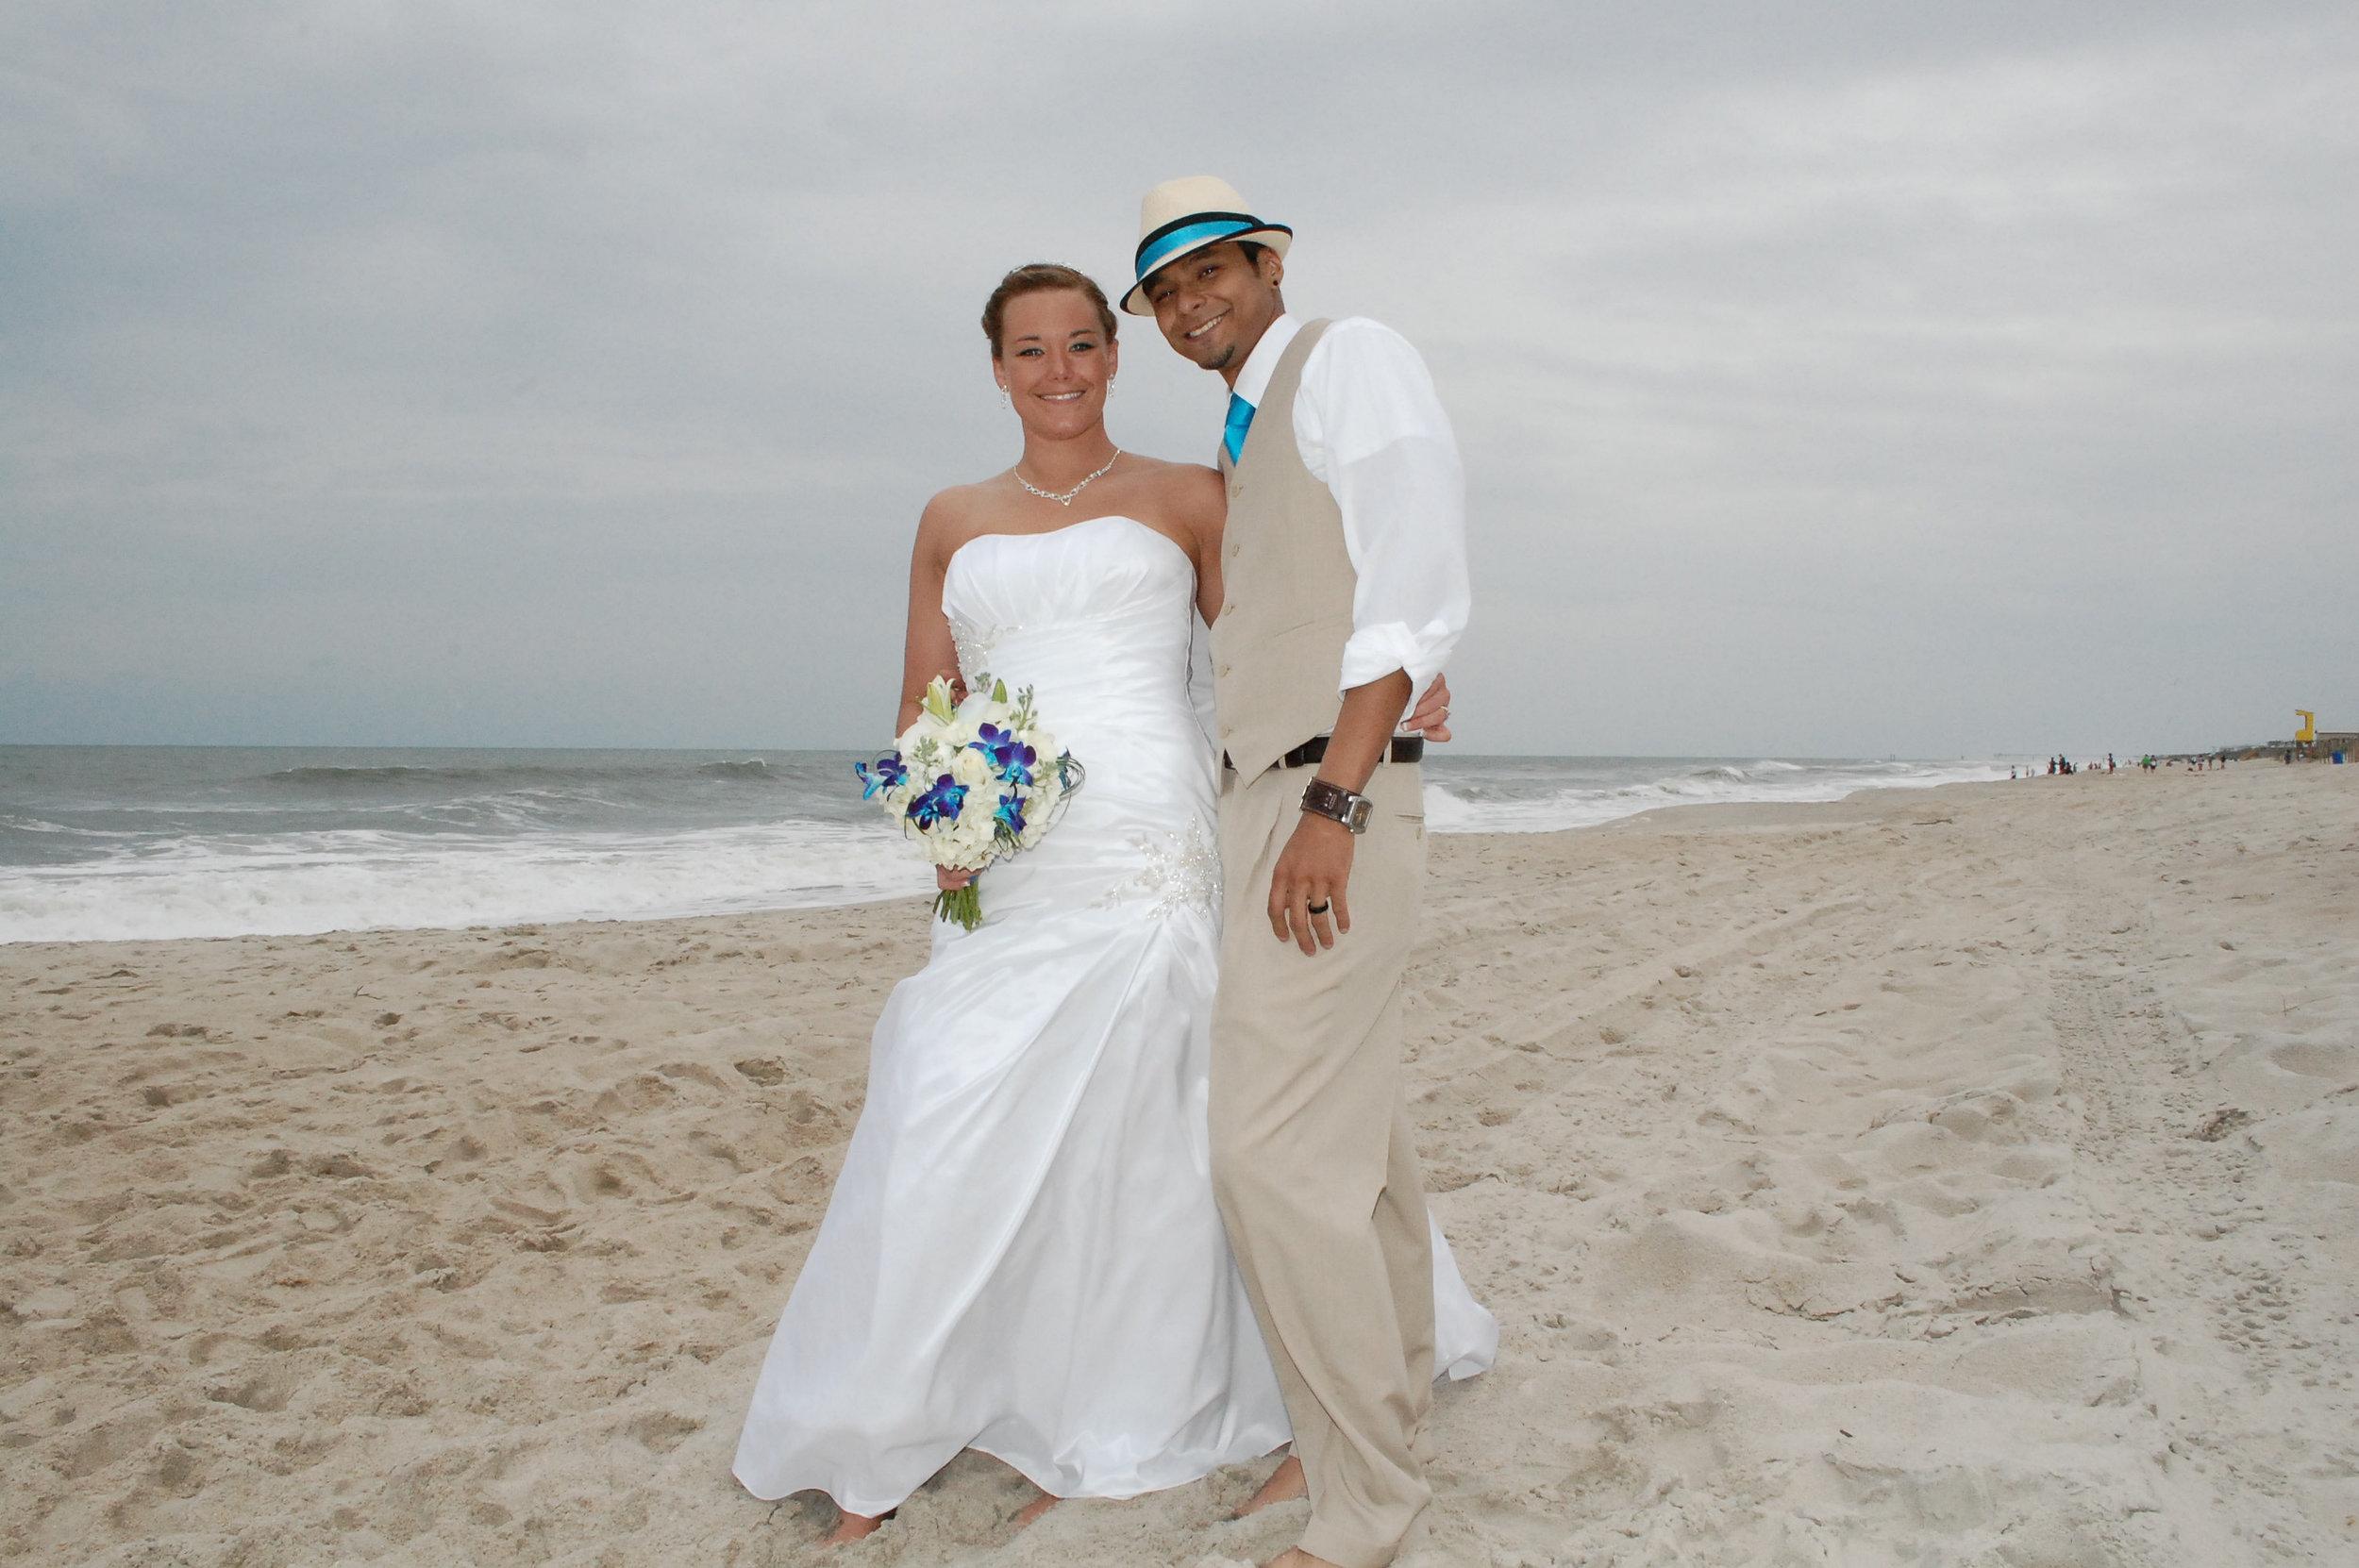 Oak Island Bride and Groom